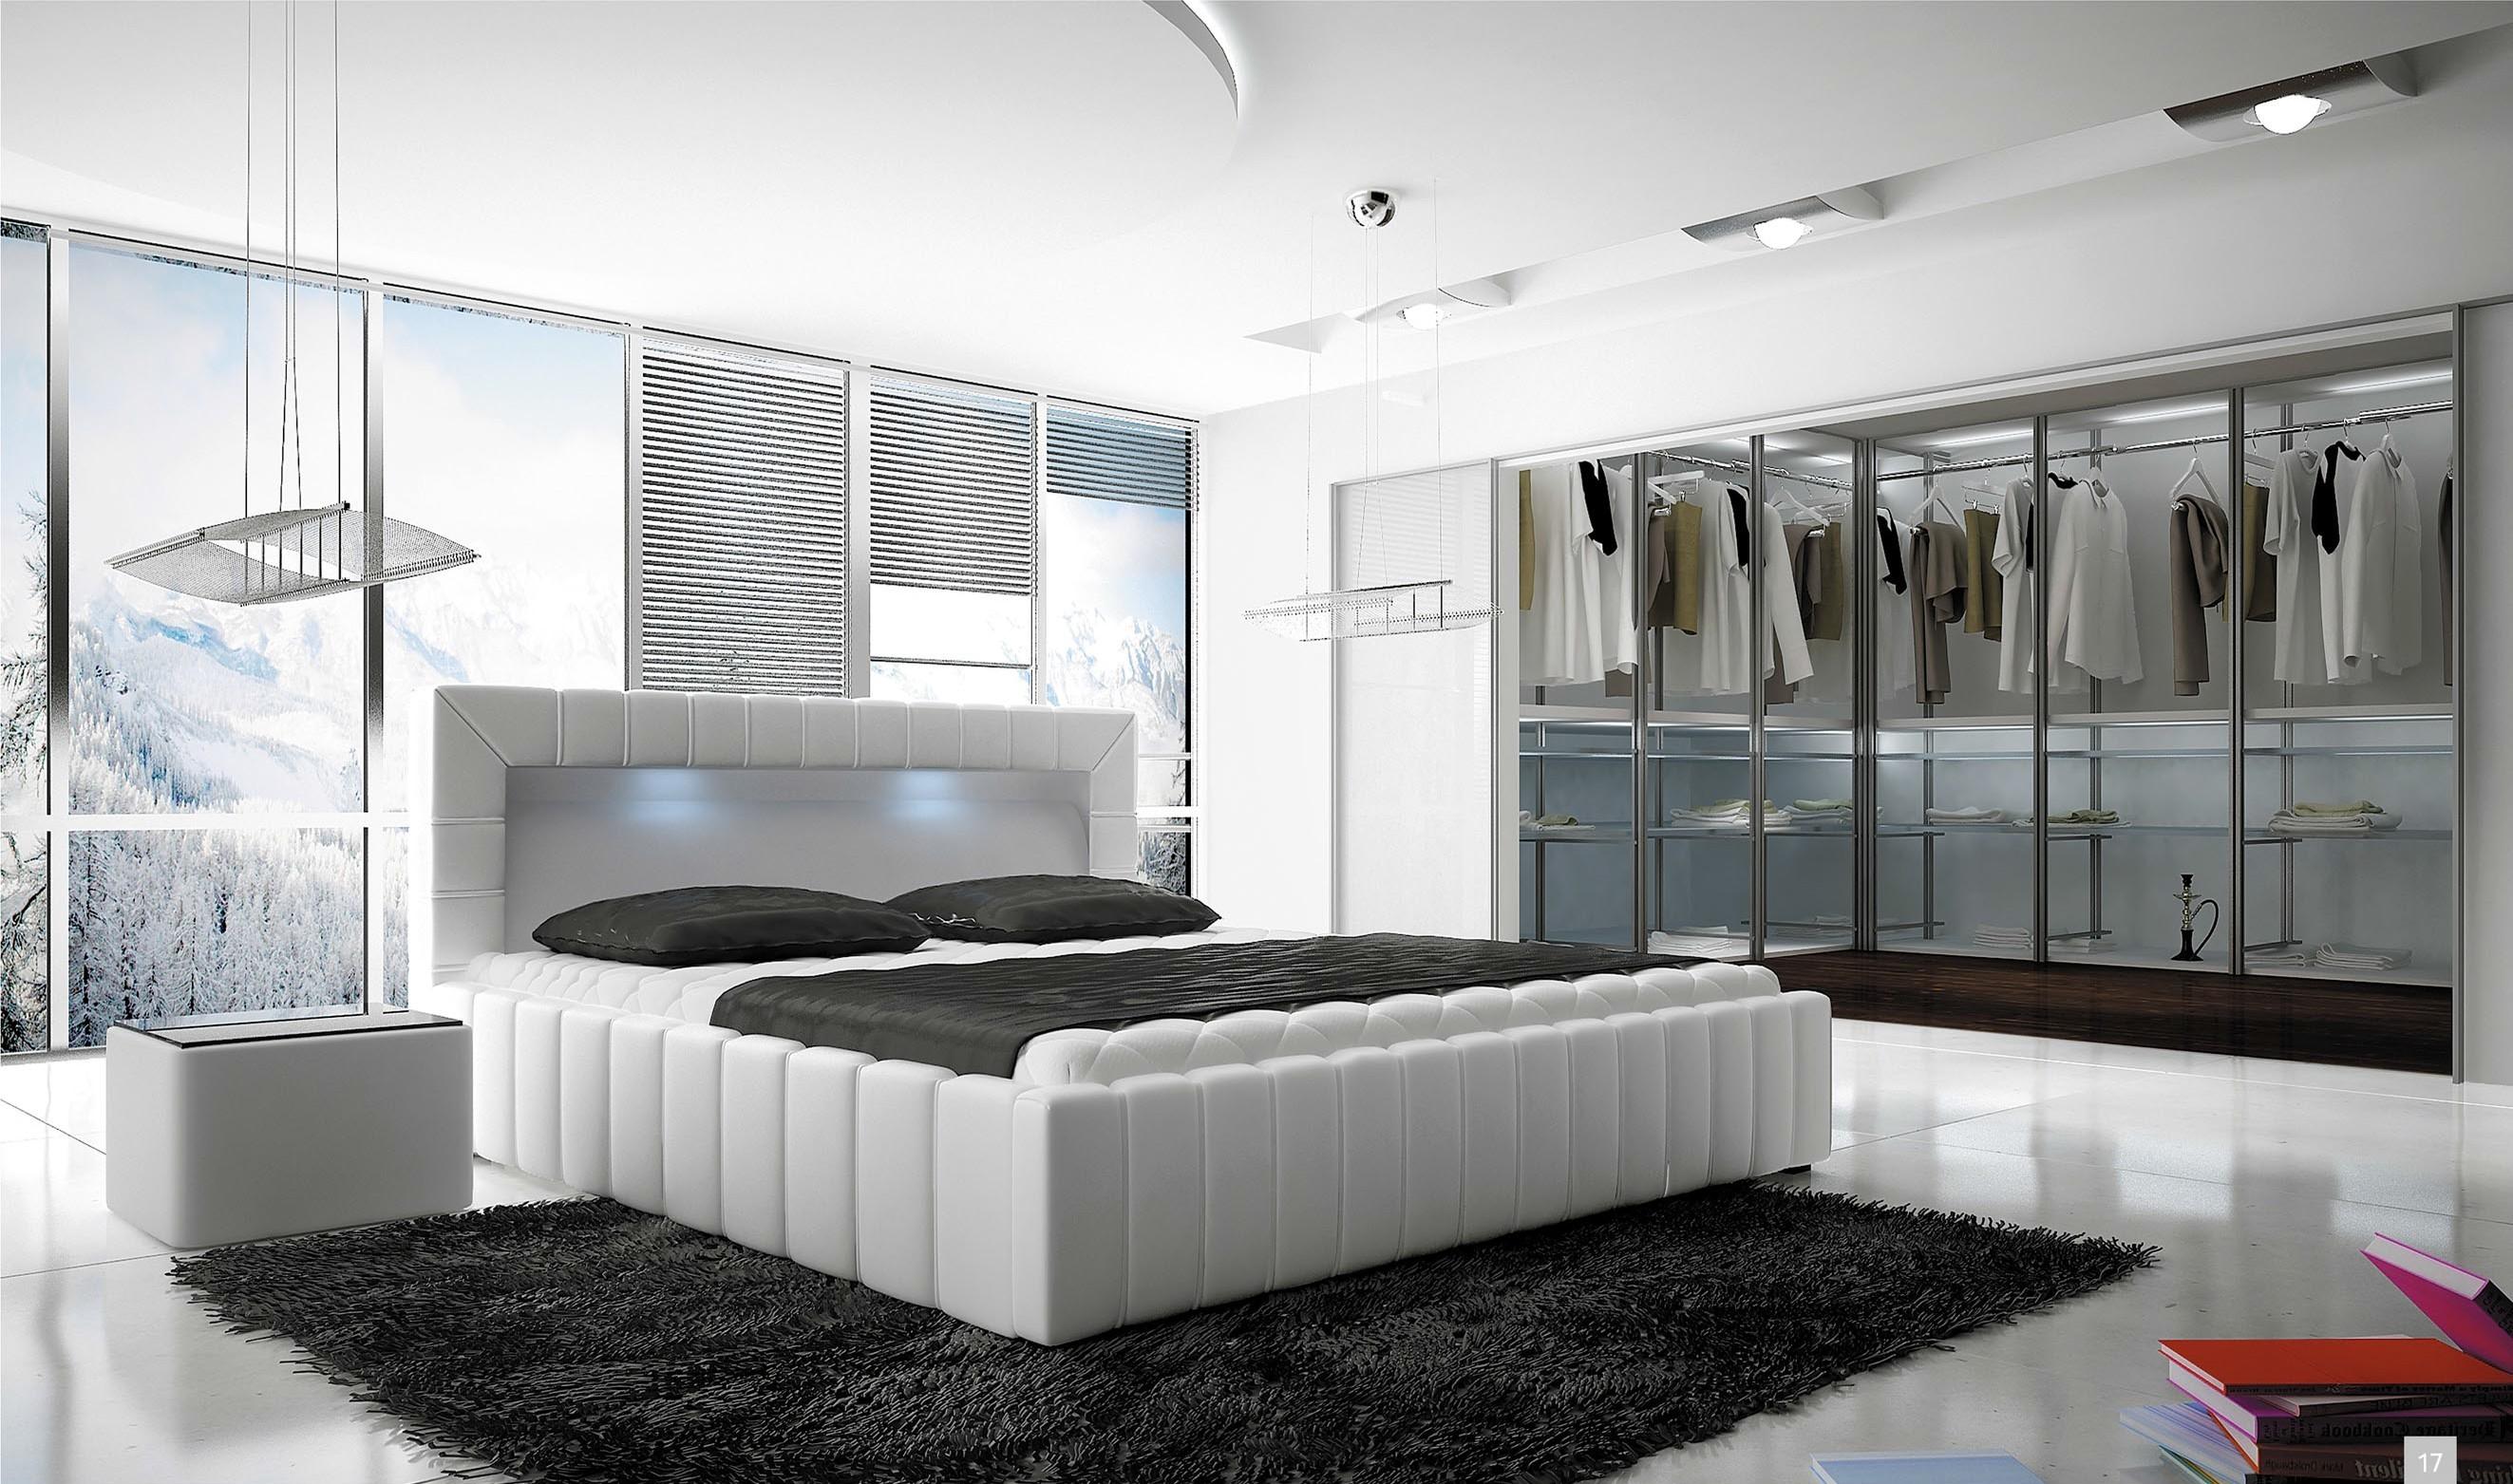 bett polsterbett lucca 160x200 mit led bettkasten. Black Bedroom Furniture Sets. Home Design Ideas